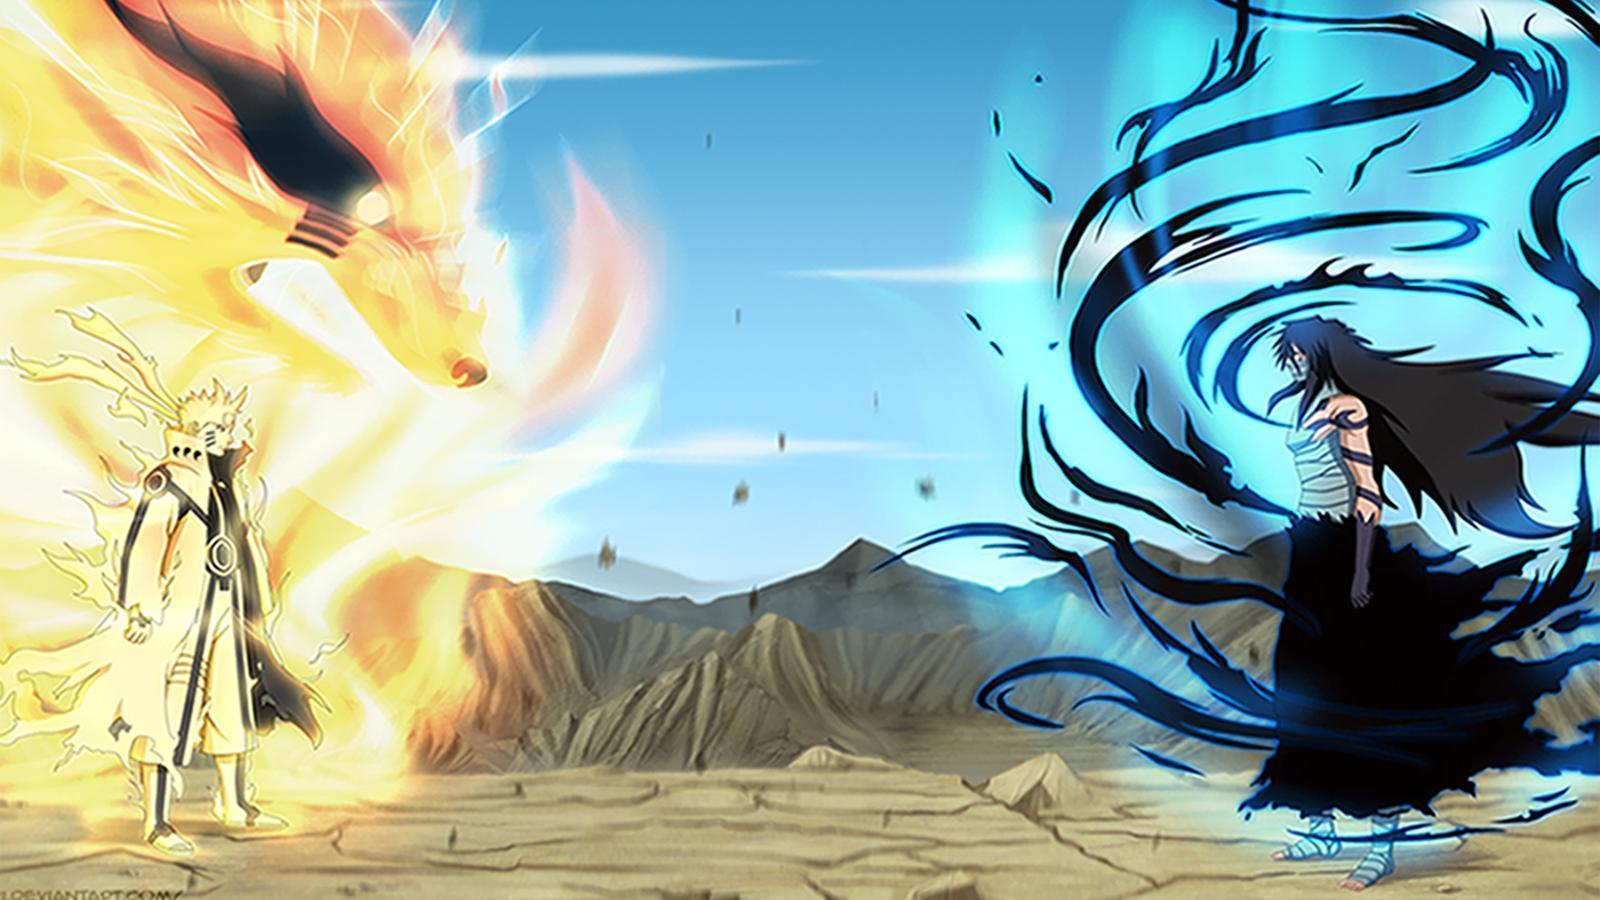 Download Wallpaper Naruto Blue - OG8lte5  Photograph_895677.jpg